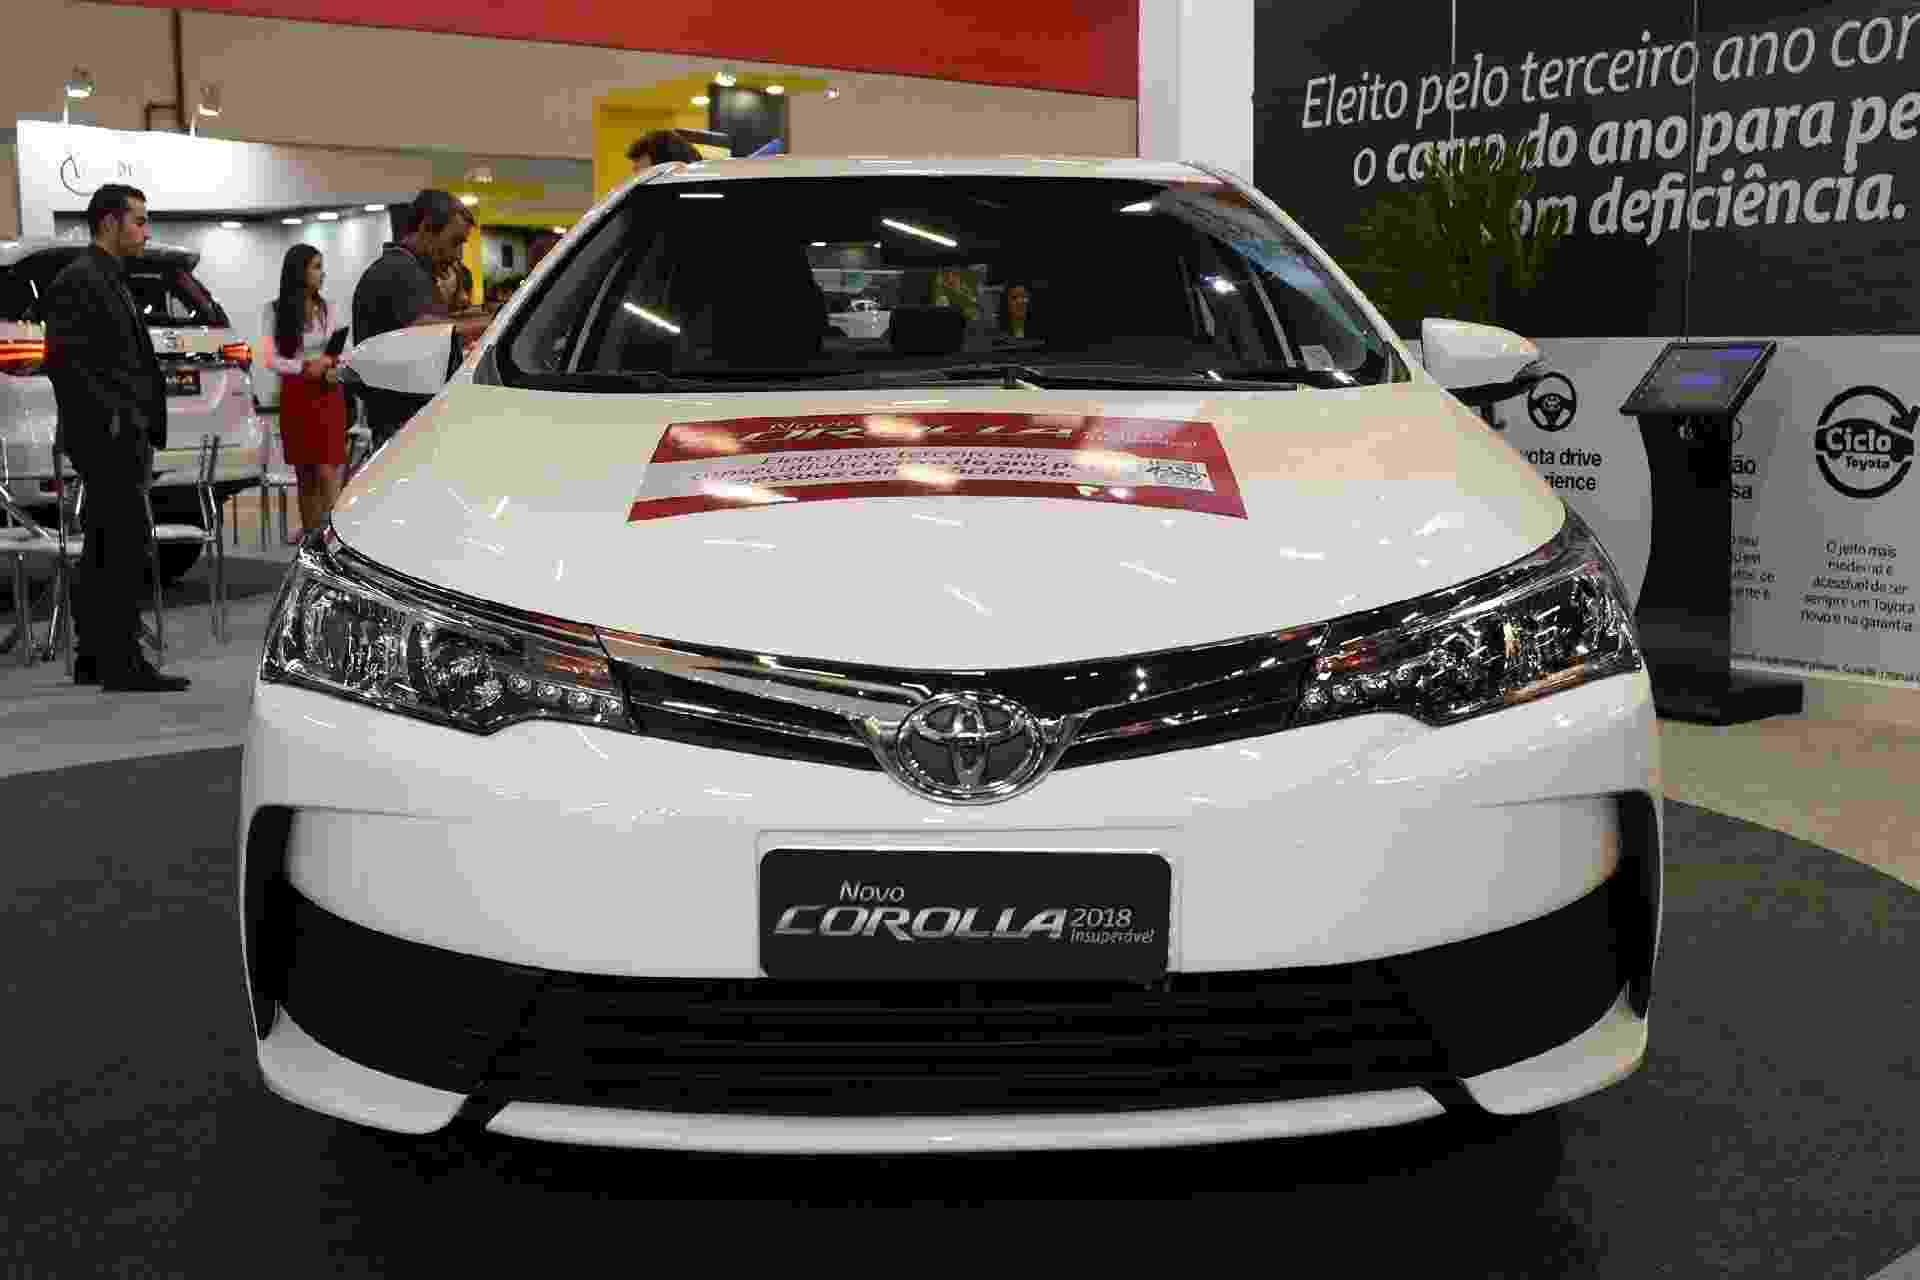 Toyota Corolla GLi tecido - Murilo Góes/UOL